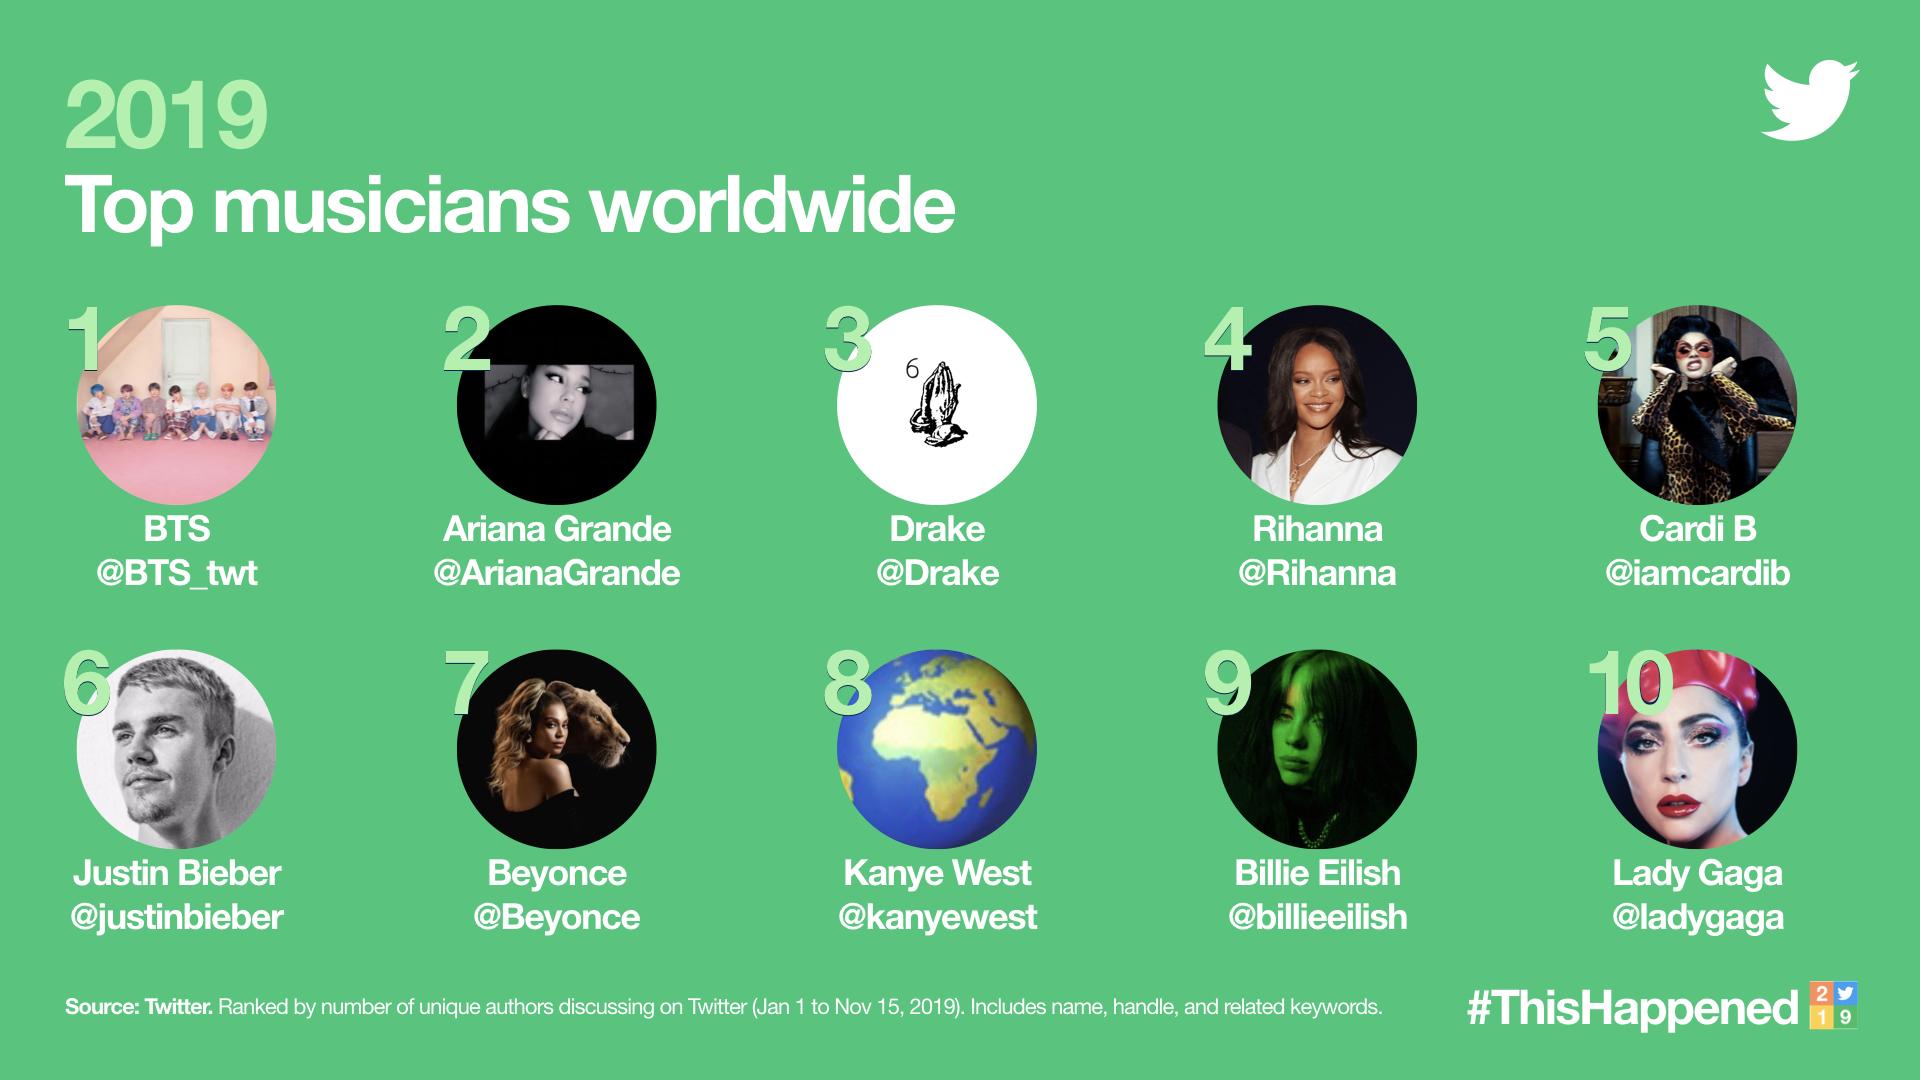 top10 twitter2019 - 10 самых обсуждаемых артистов на Twitter в 2019 году